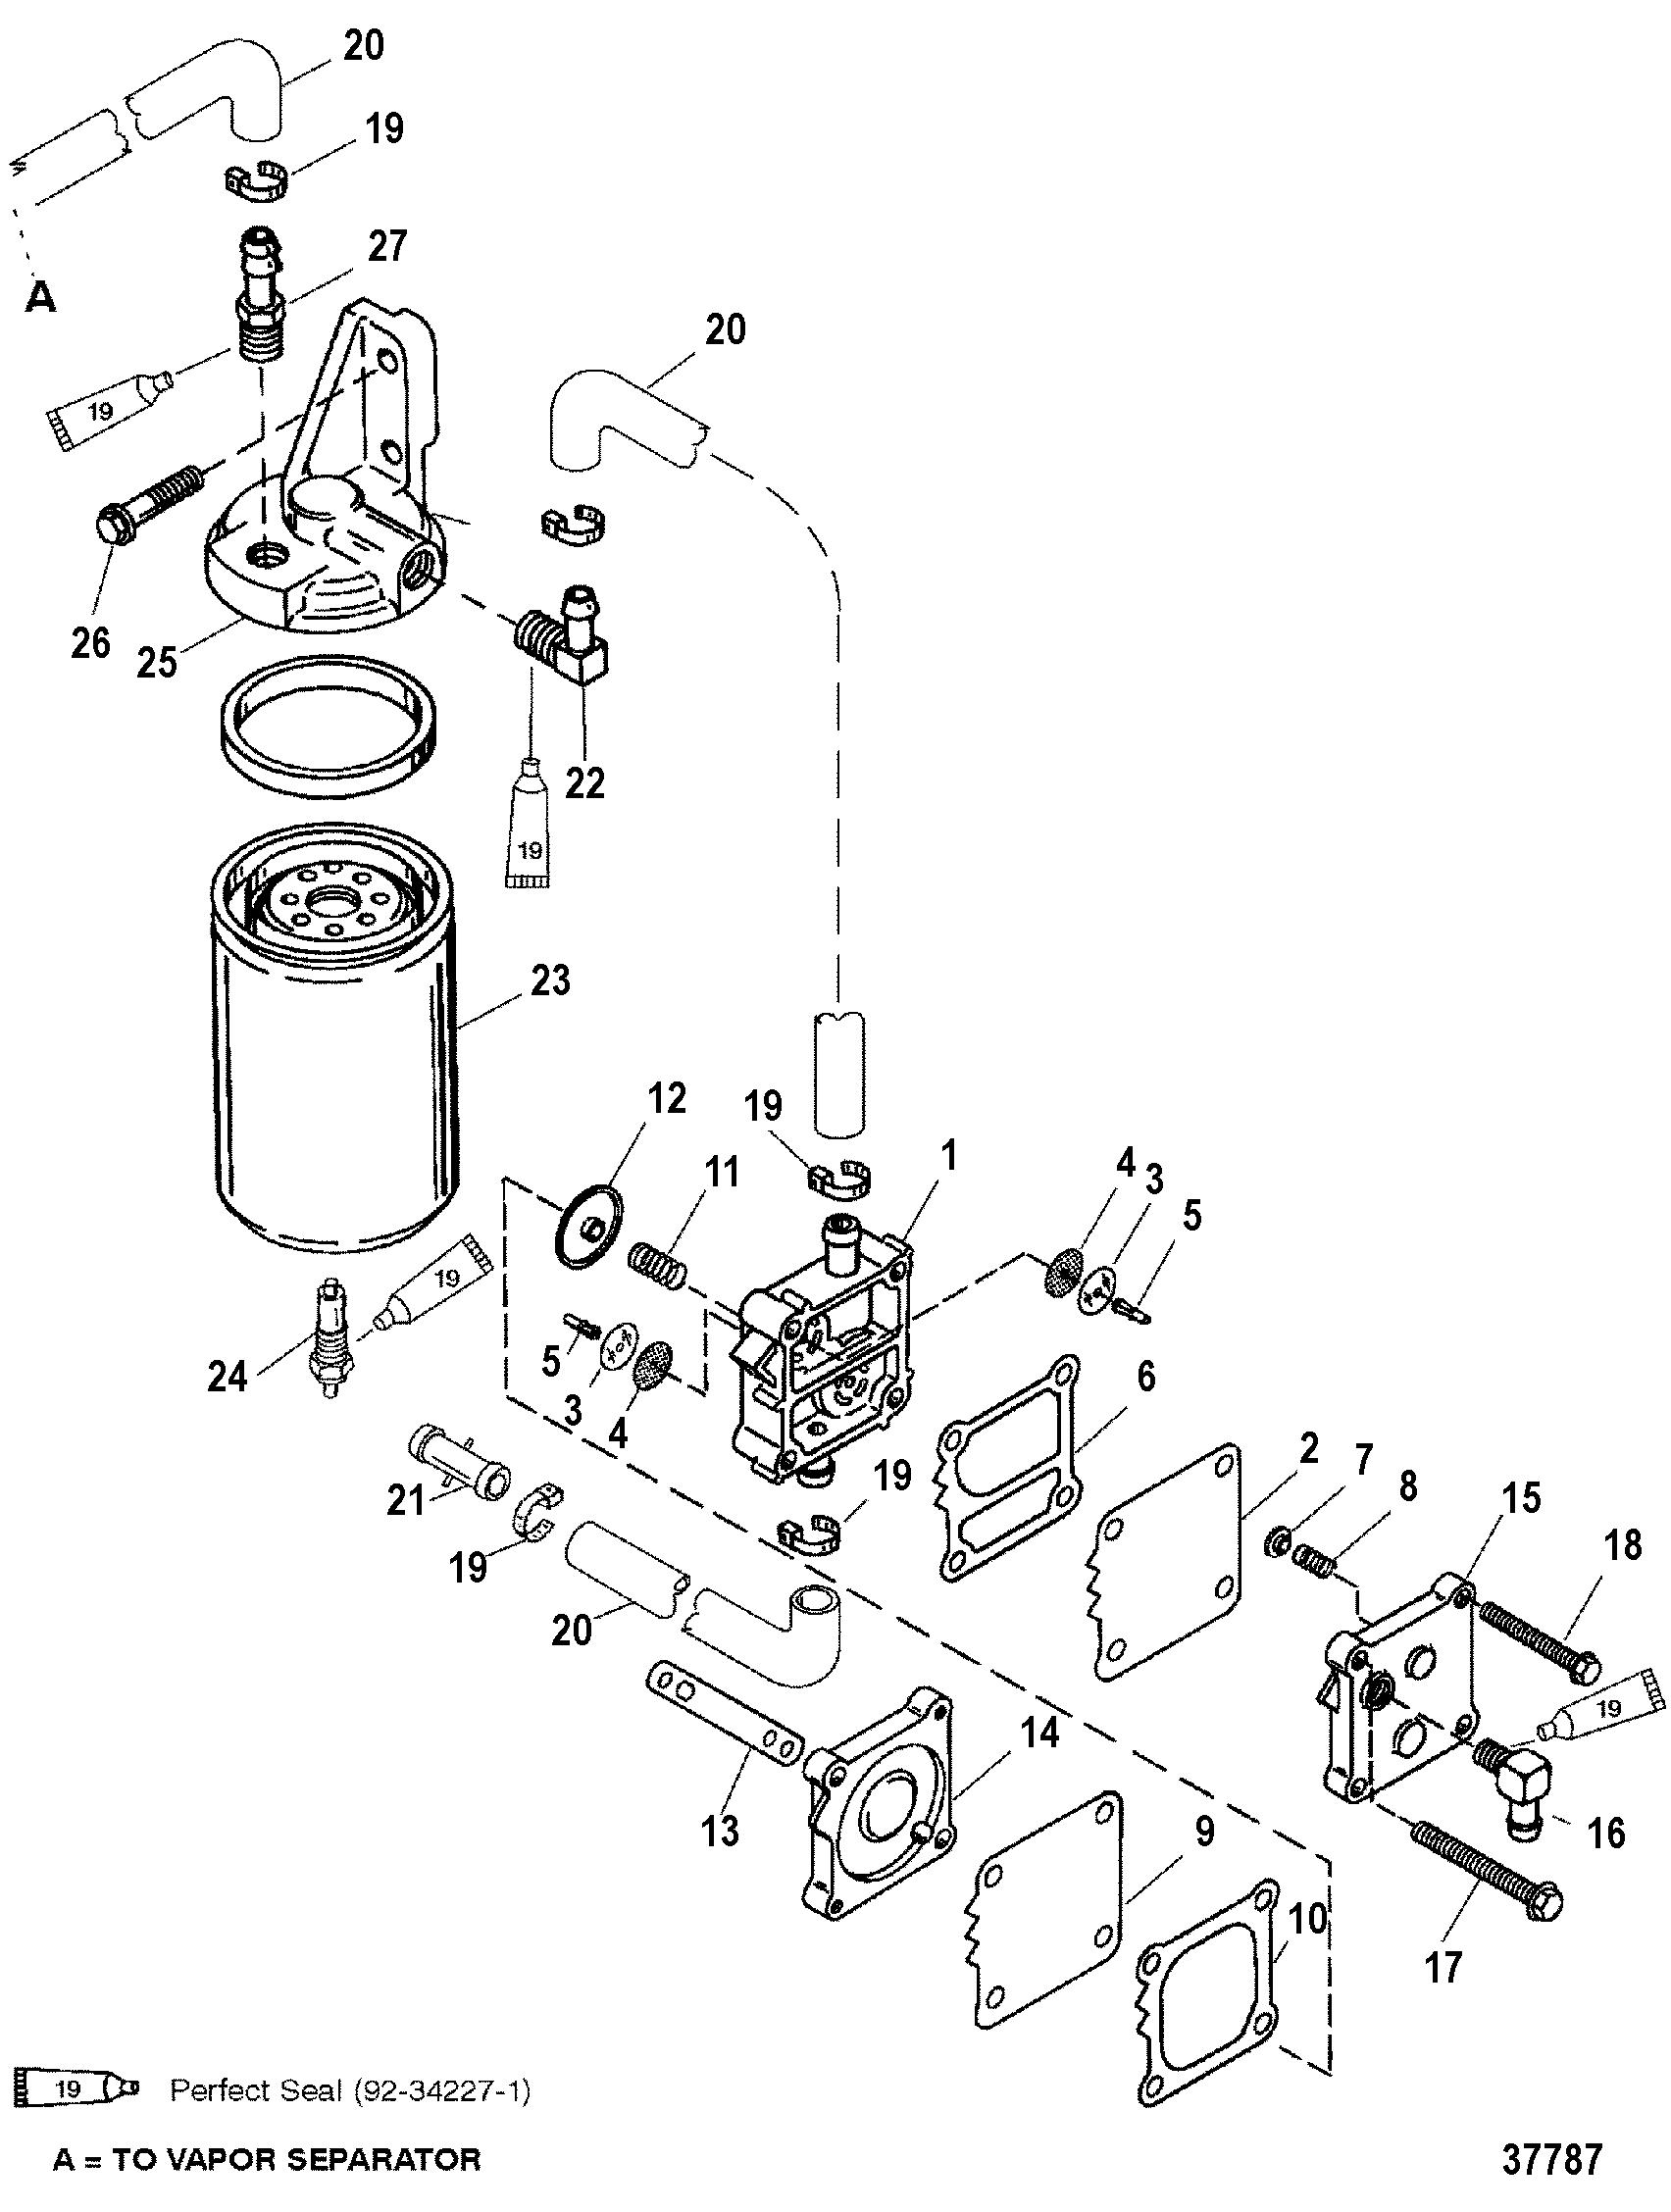 dauntless 225 engine fuel pump  dauntless  free engine